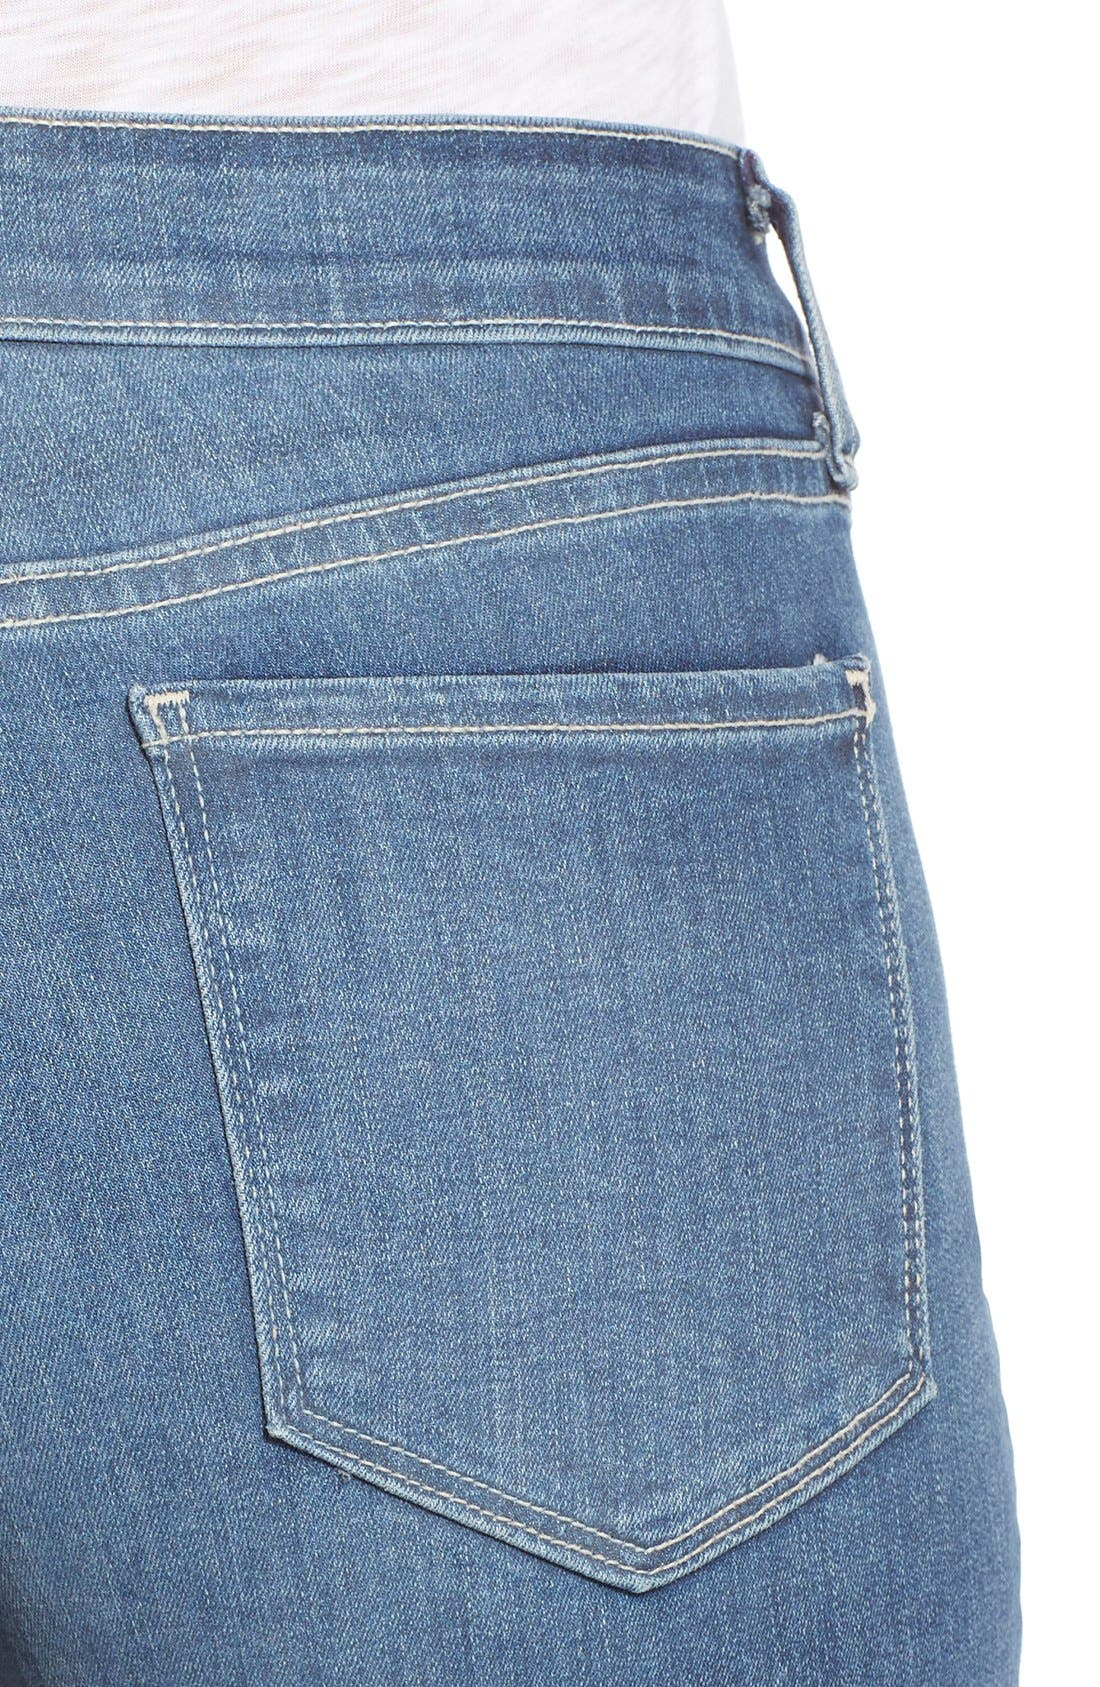 'Samantha' Stretch Slim Straight Leg Jeans,                             Alternate thumbnail 5, color,                             421